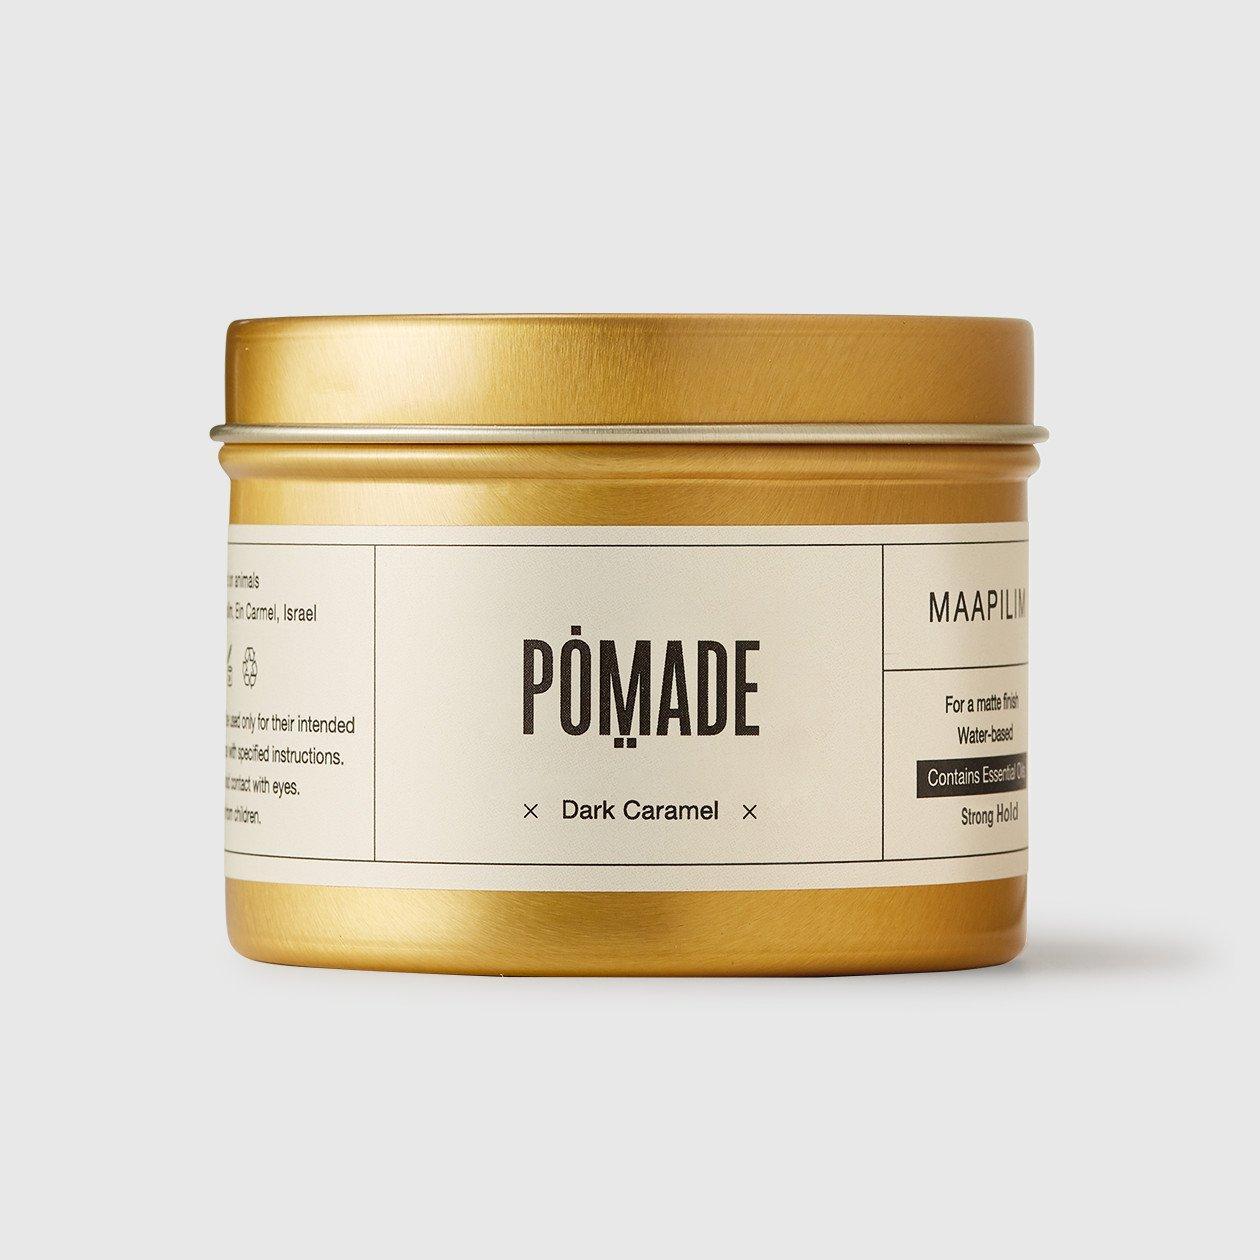 Pomade